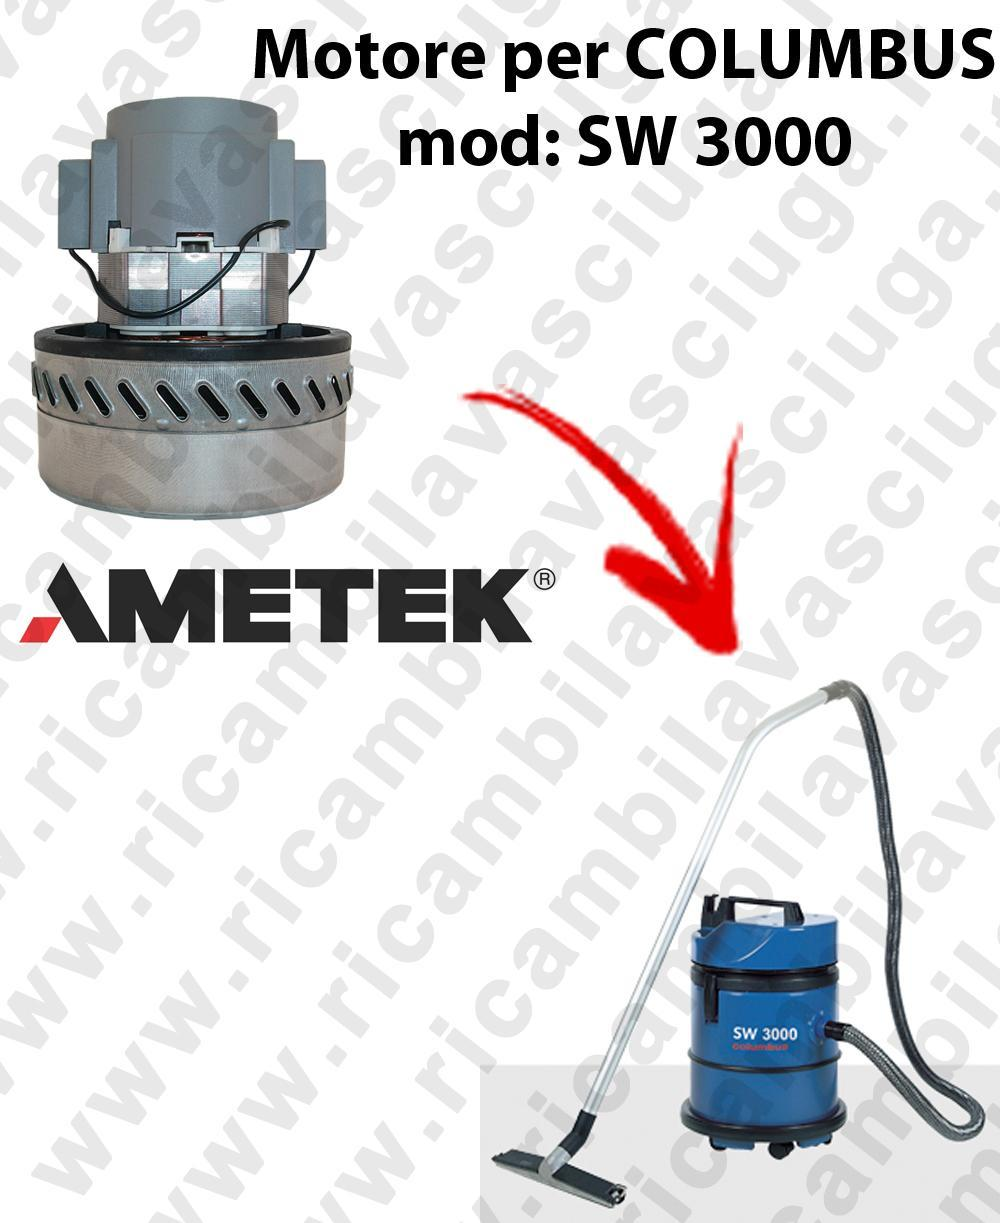 SW 3000 Saugmotor AMETEK für Staubsauger COLUMBUS